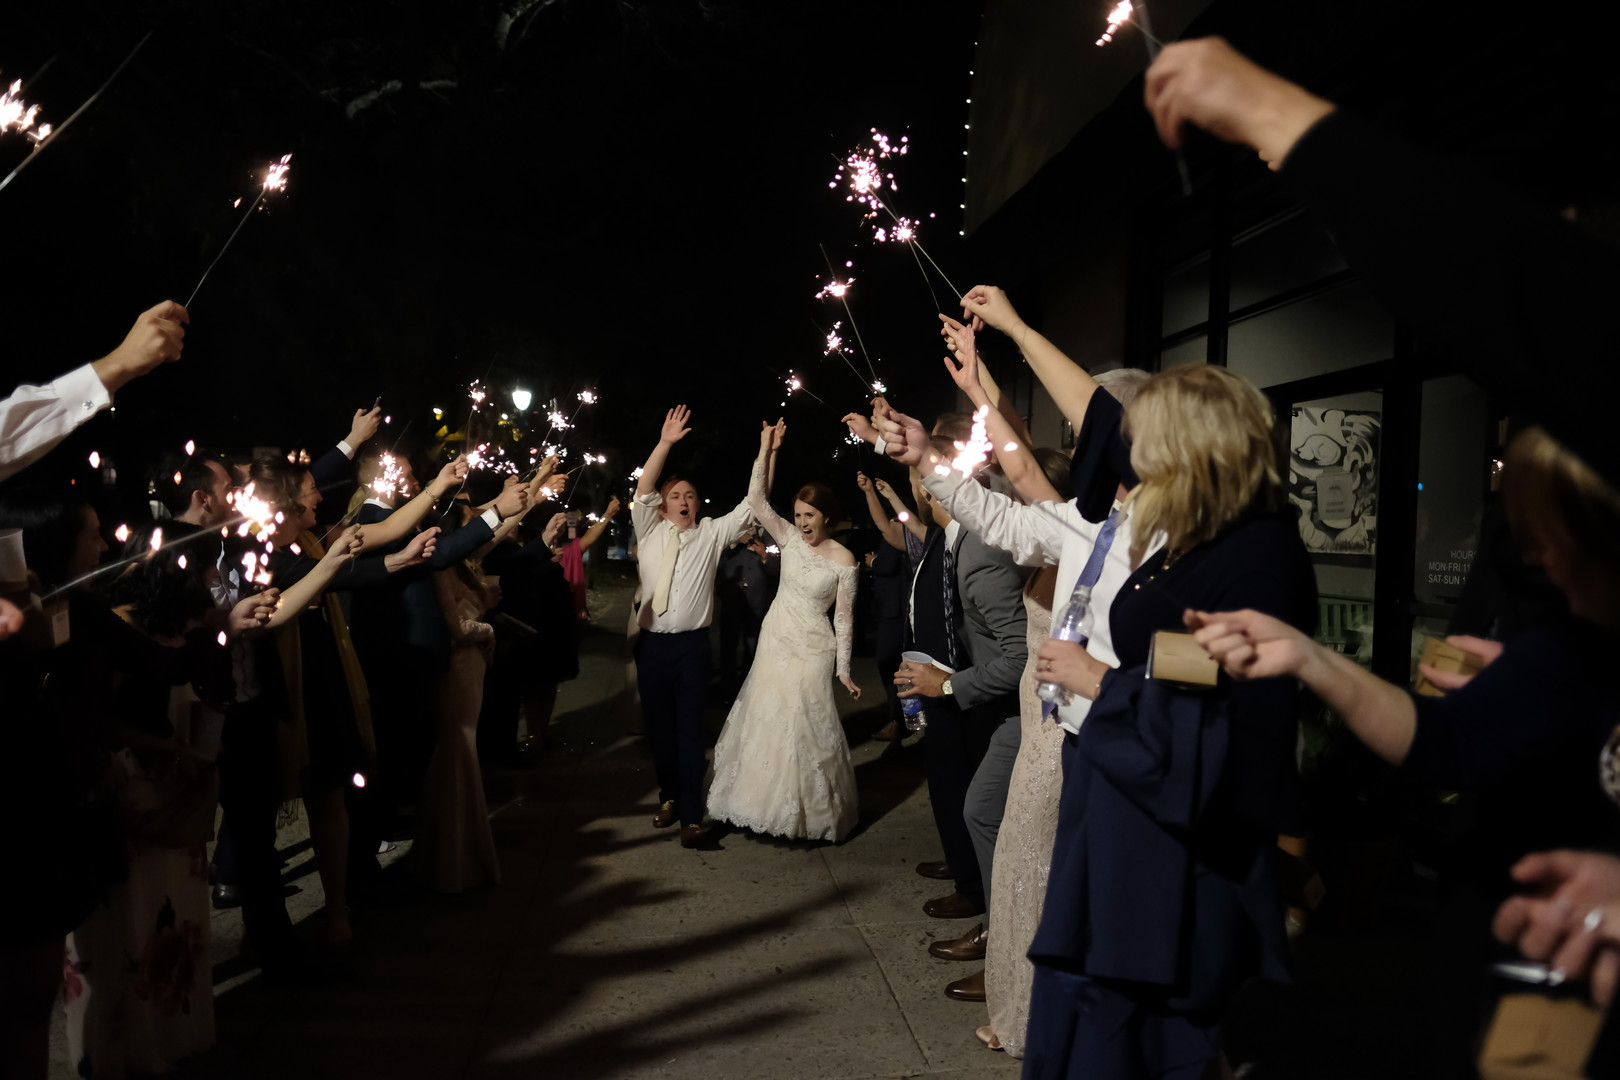 south-soho-cafe-wedding-34.jpg